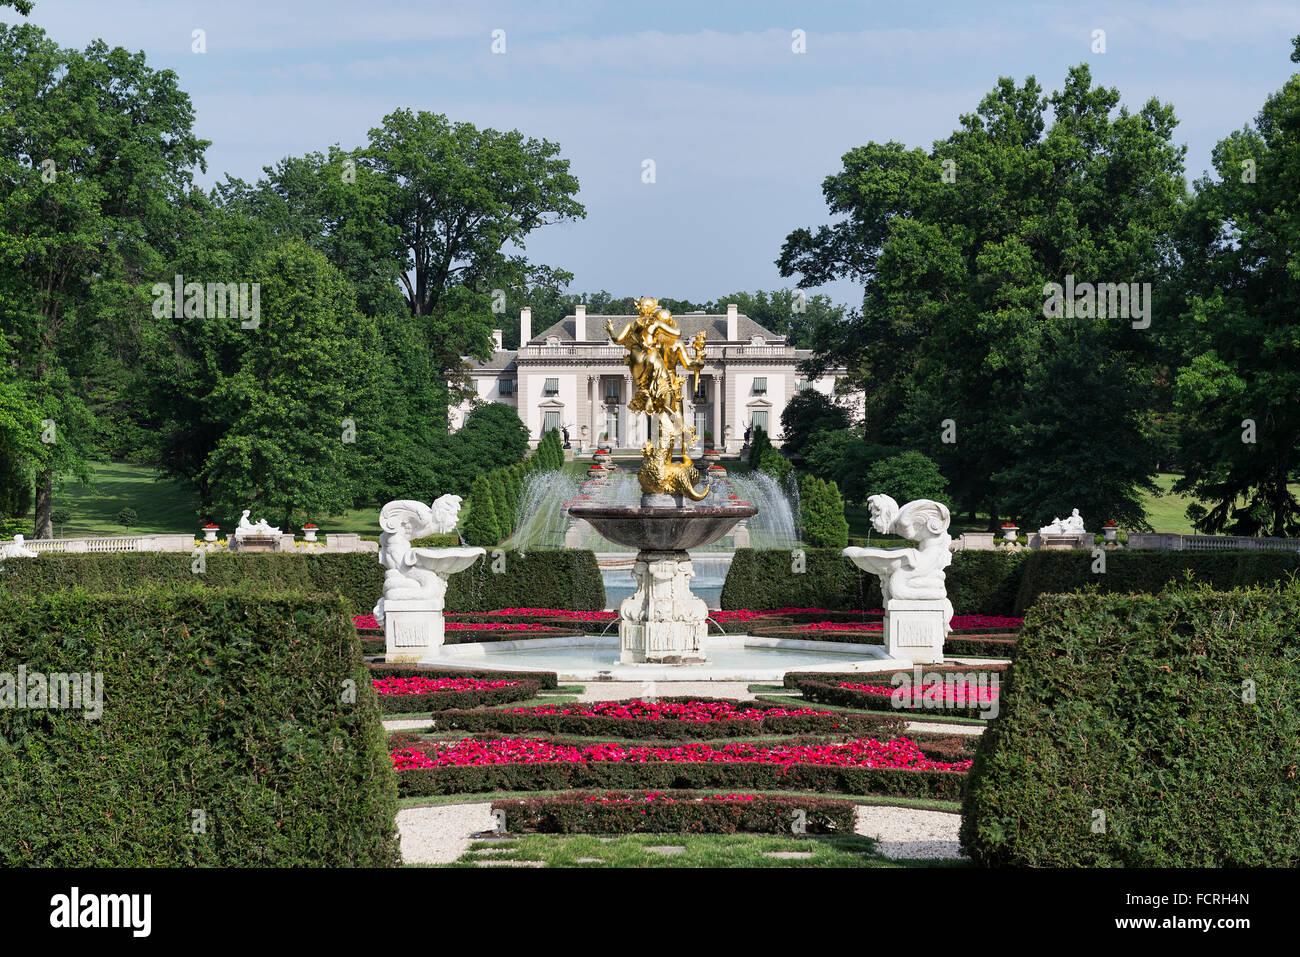 Logro estatua, Nemours Mansion y jardines, Wilmington, Delaware, EE.UU. Imagen De Stock